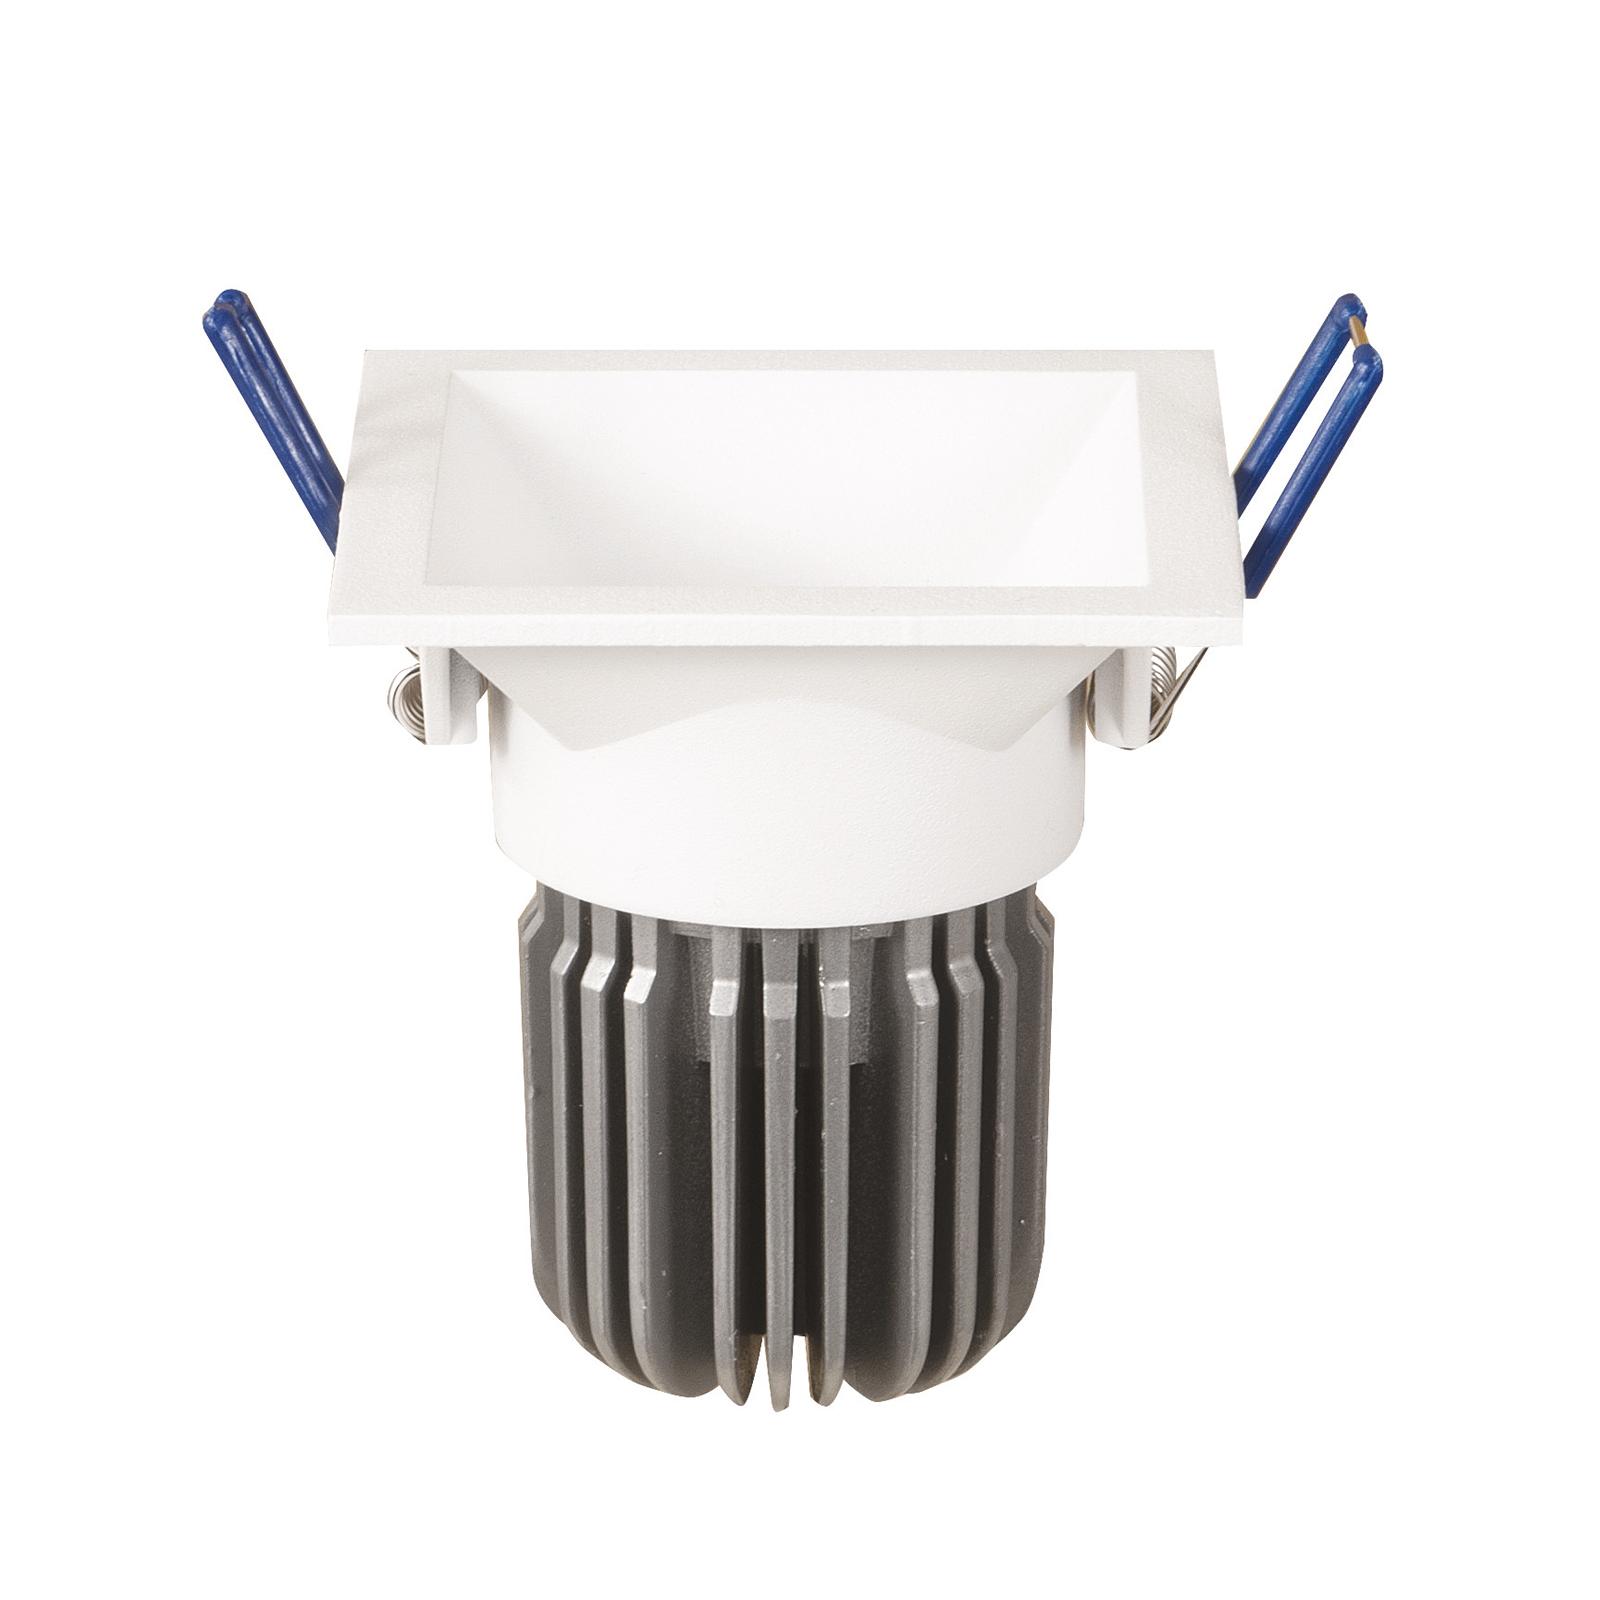 LED-Einbaulampe Toodle eckig symmetrisch, weiß